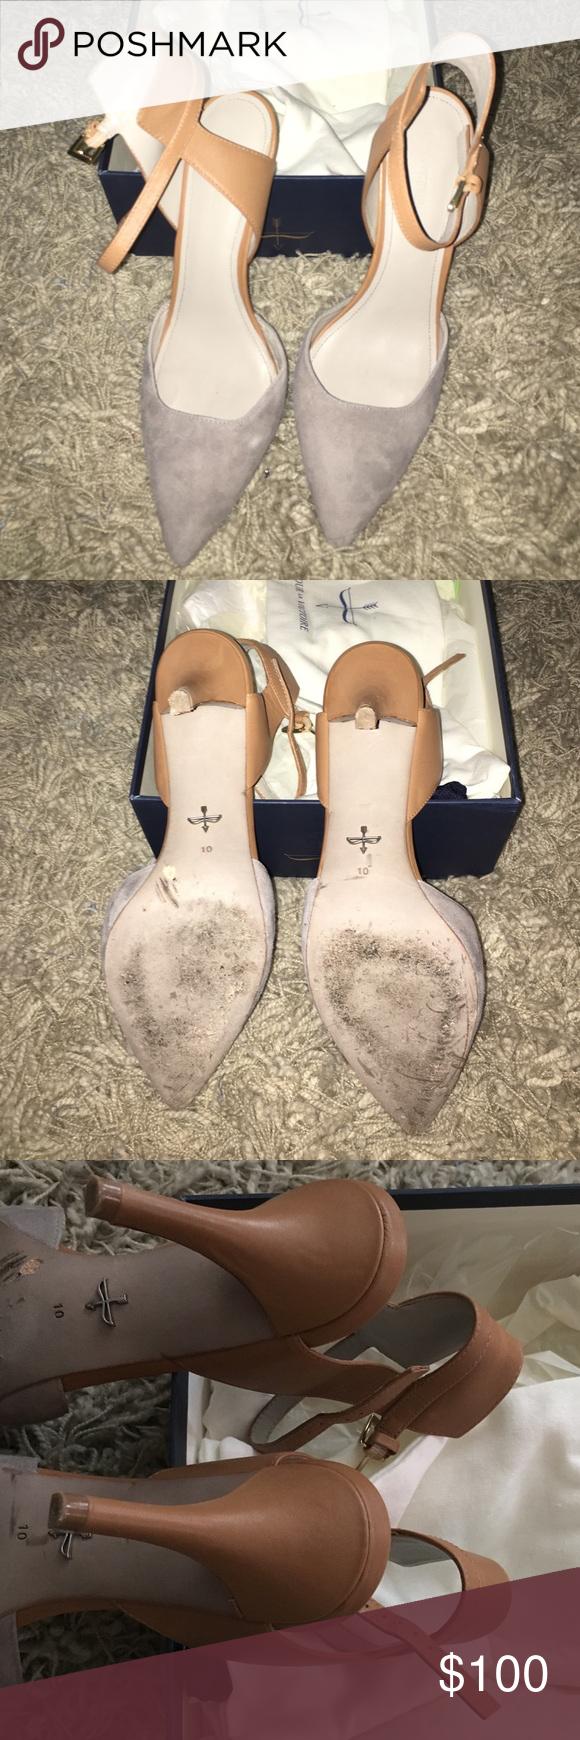 Pour la Victoire Heels Pre-owned worn once Style: Gia, Color: Ash/Honey, Material: Kid suede /Polished calf Size:  10M Pour la Victoire Shoes Heels